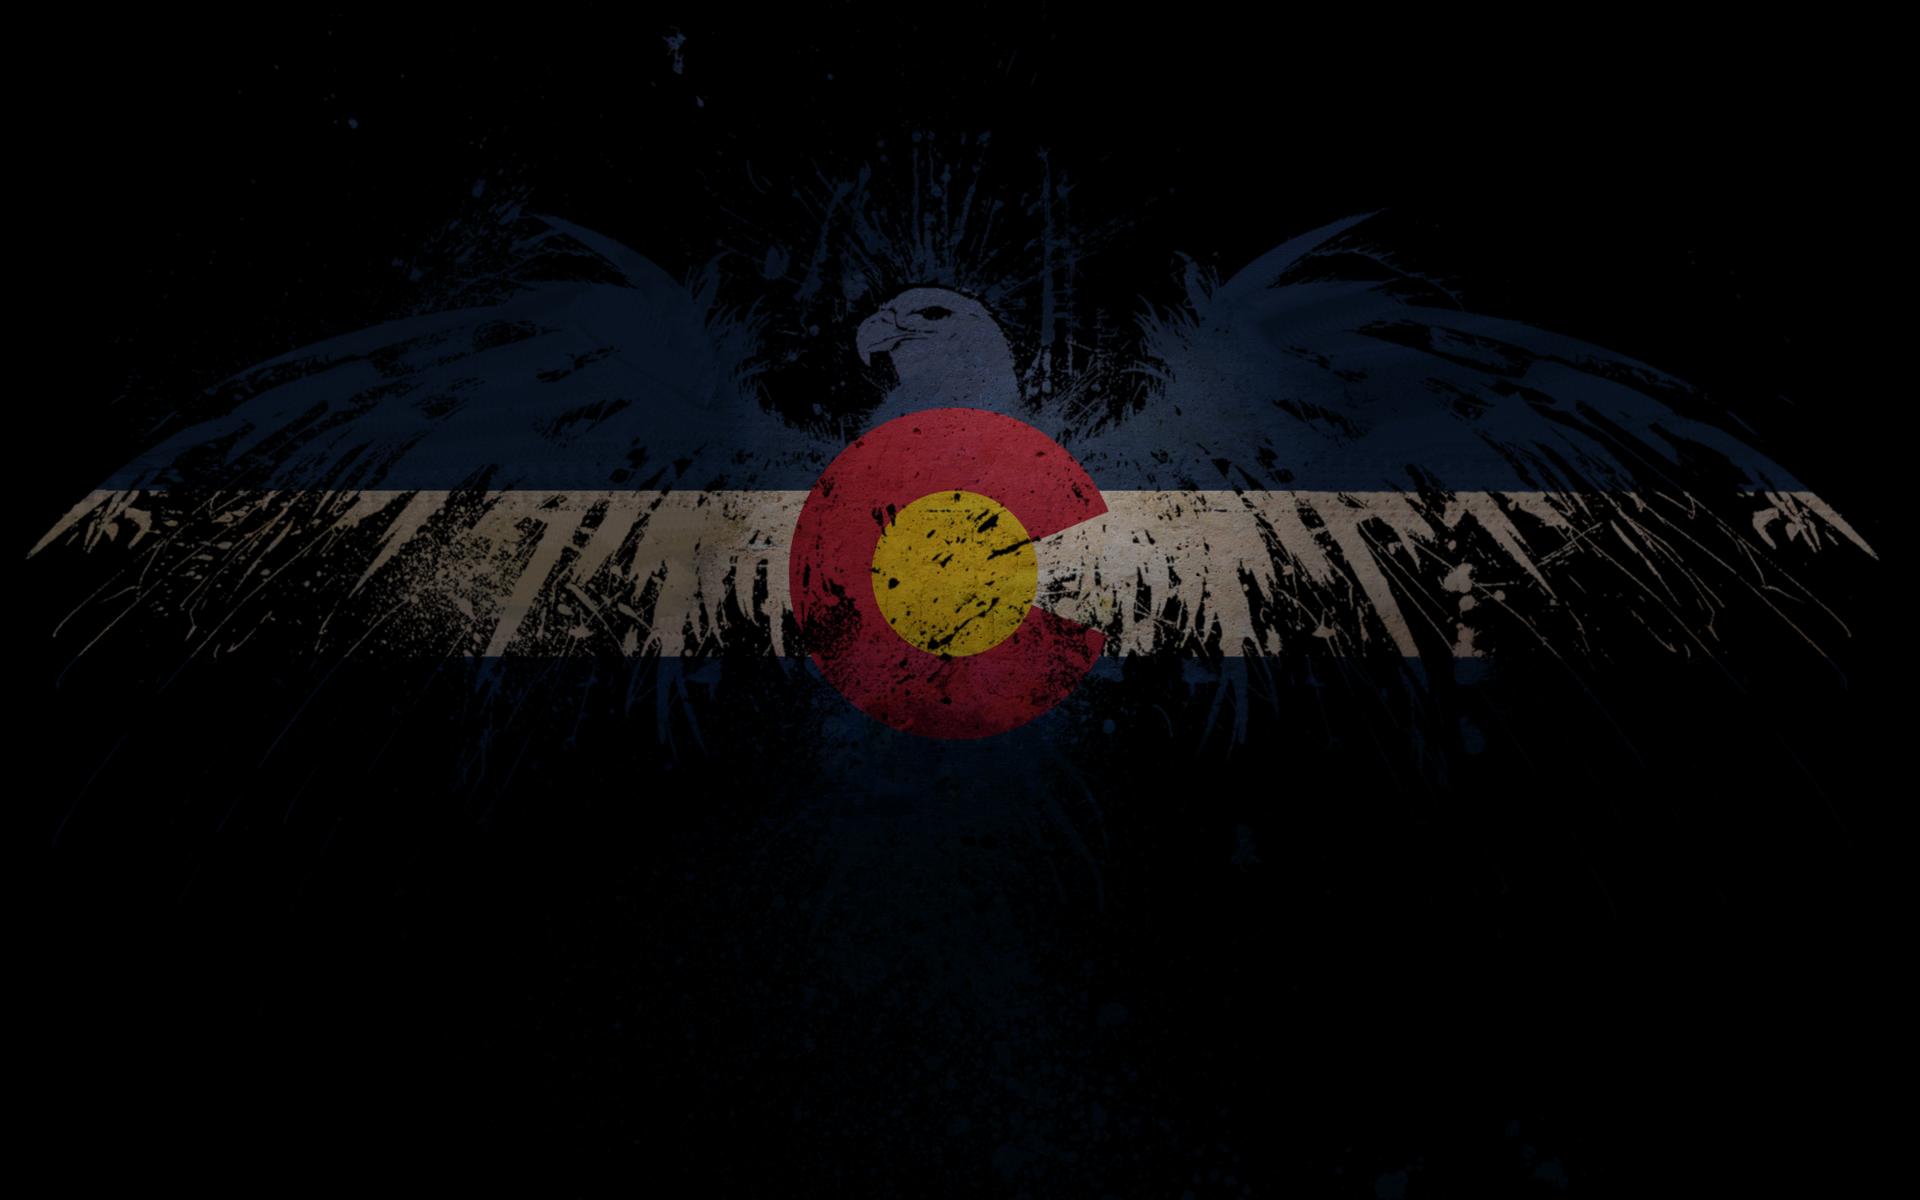 Birds argentina flags colorado wallpaper 1920x1200 19813 1920x1200